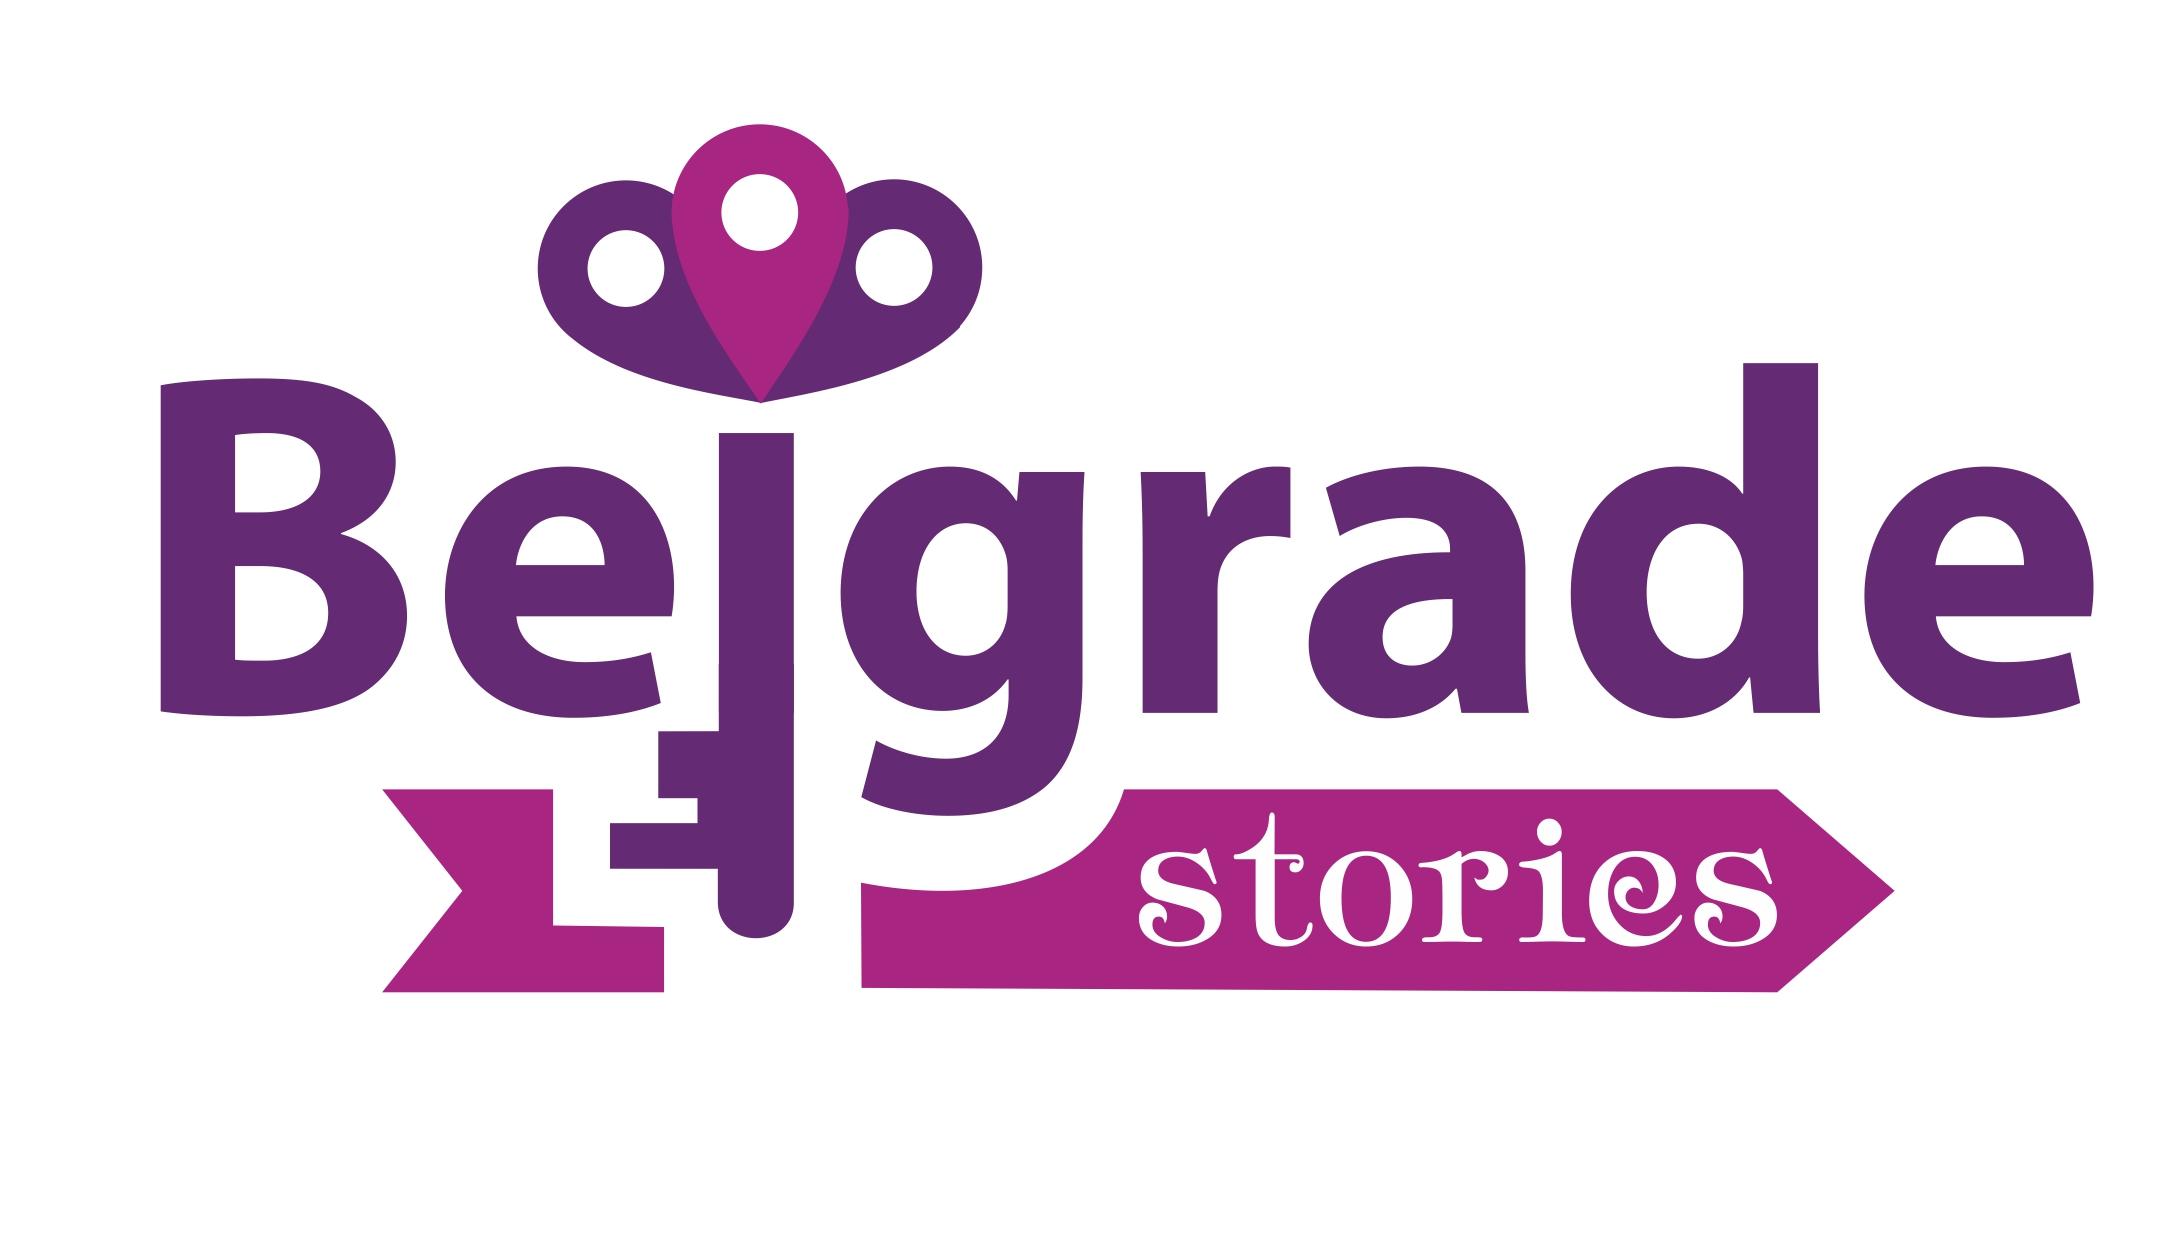 Логотип для агентства городских туров в Белграде фото f_07958986d578dbfb.jpg